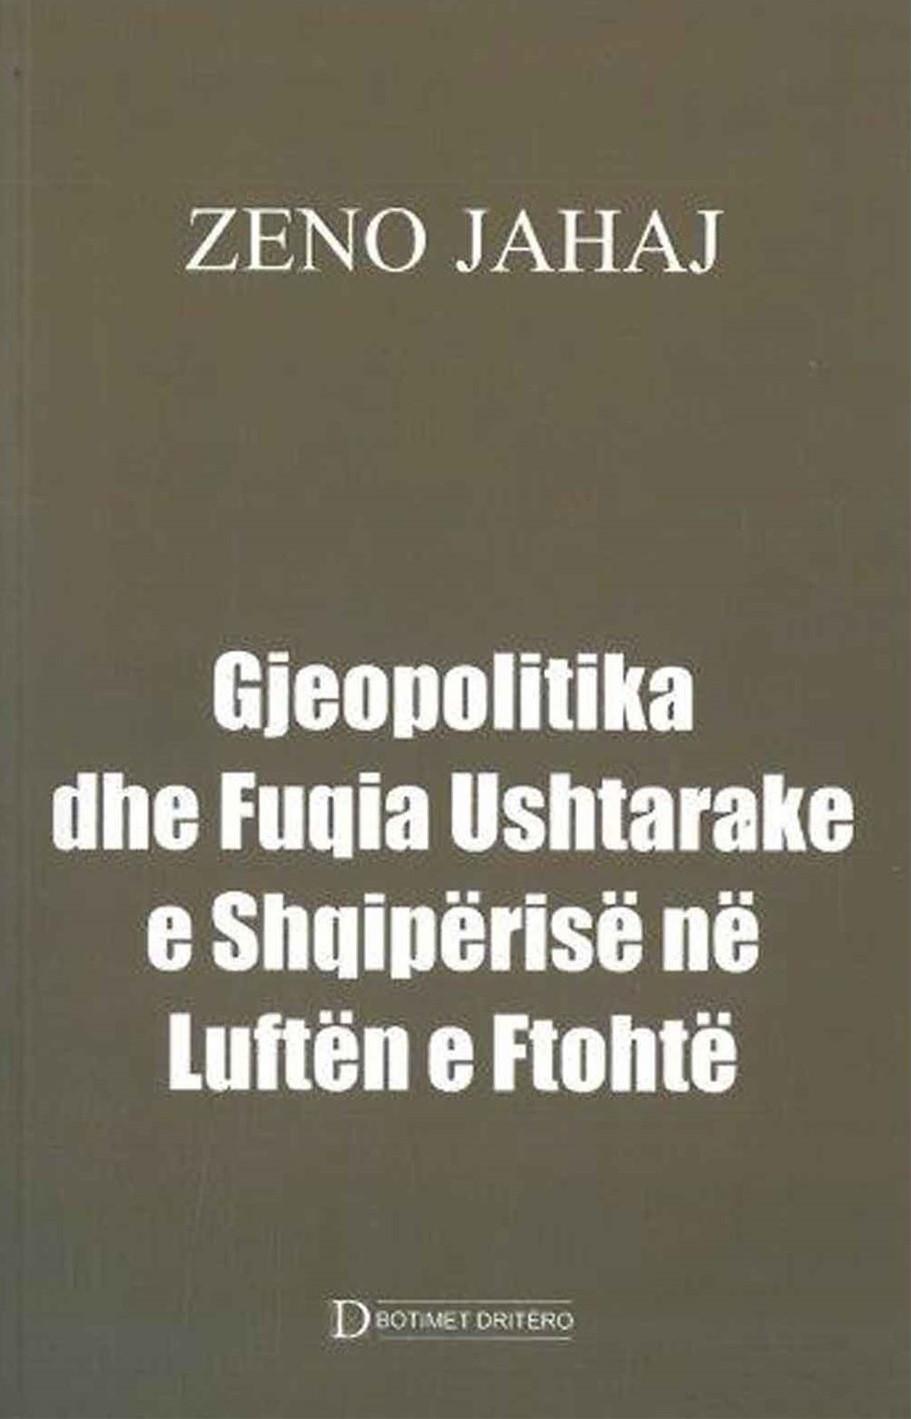 Gjeopolitika dhe fuqia ushtarake e Shqiperise ne Luften e Ftohte